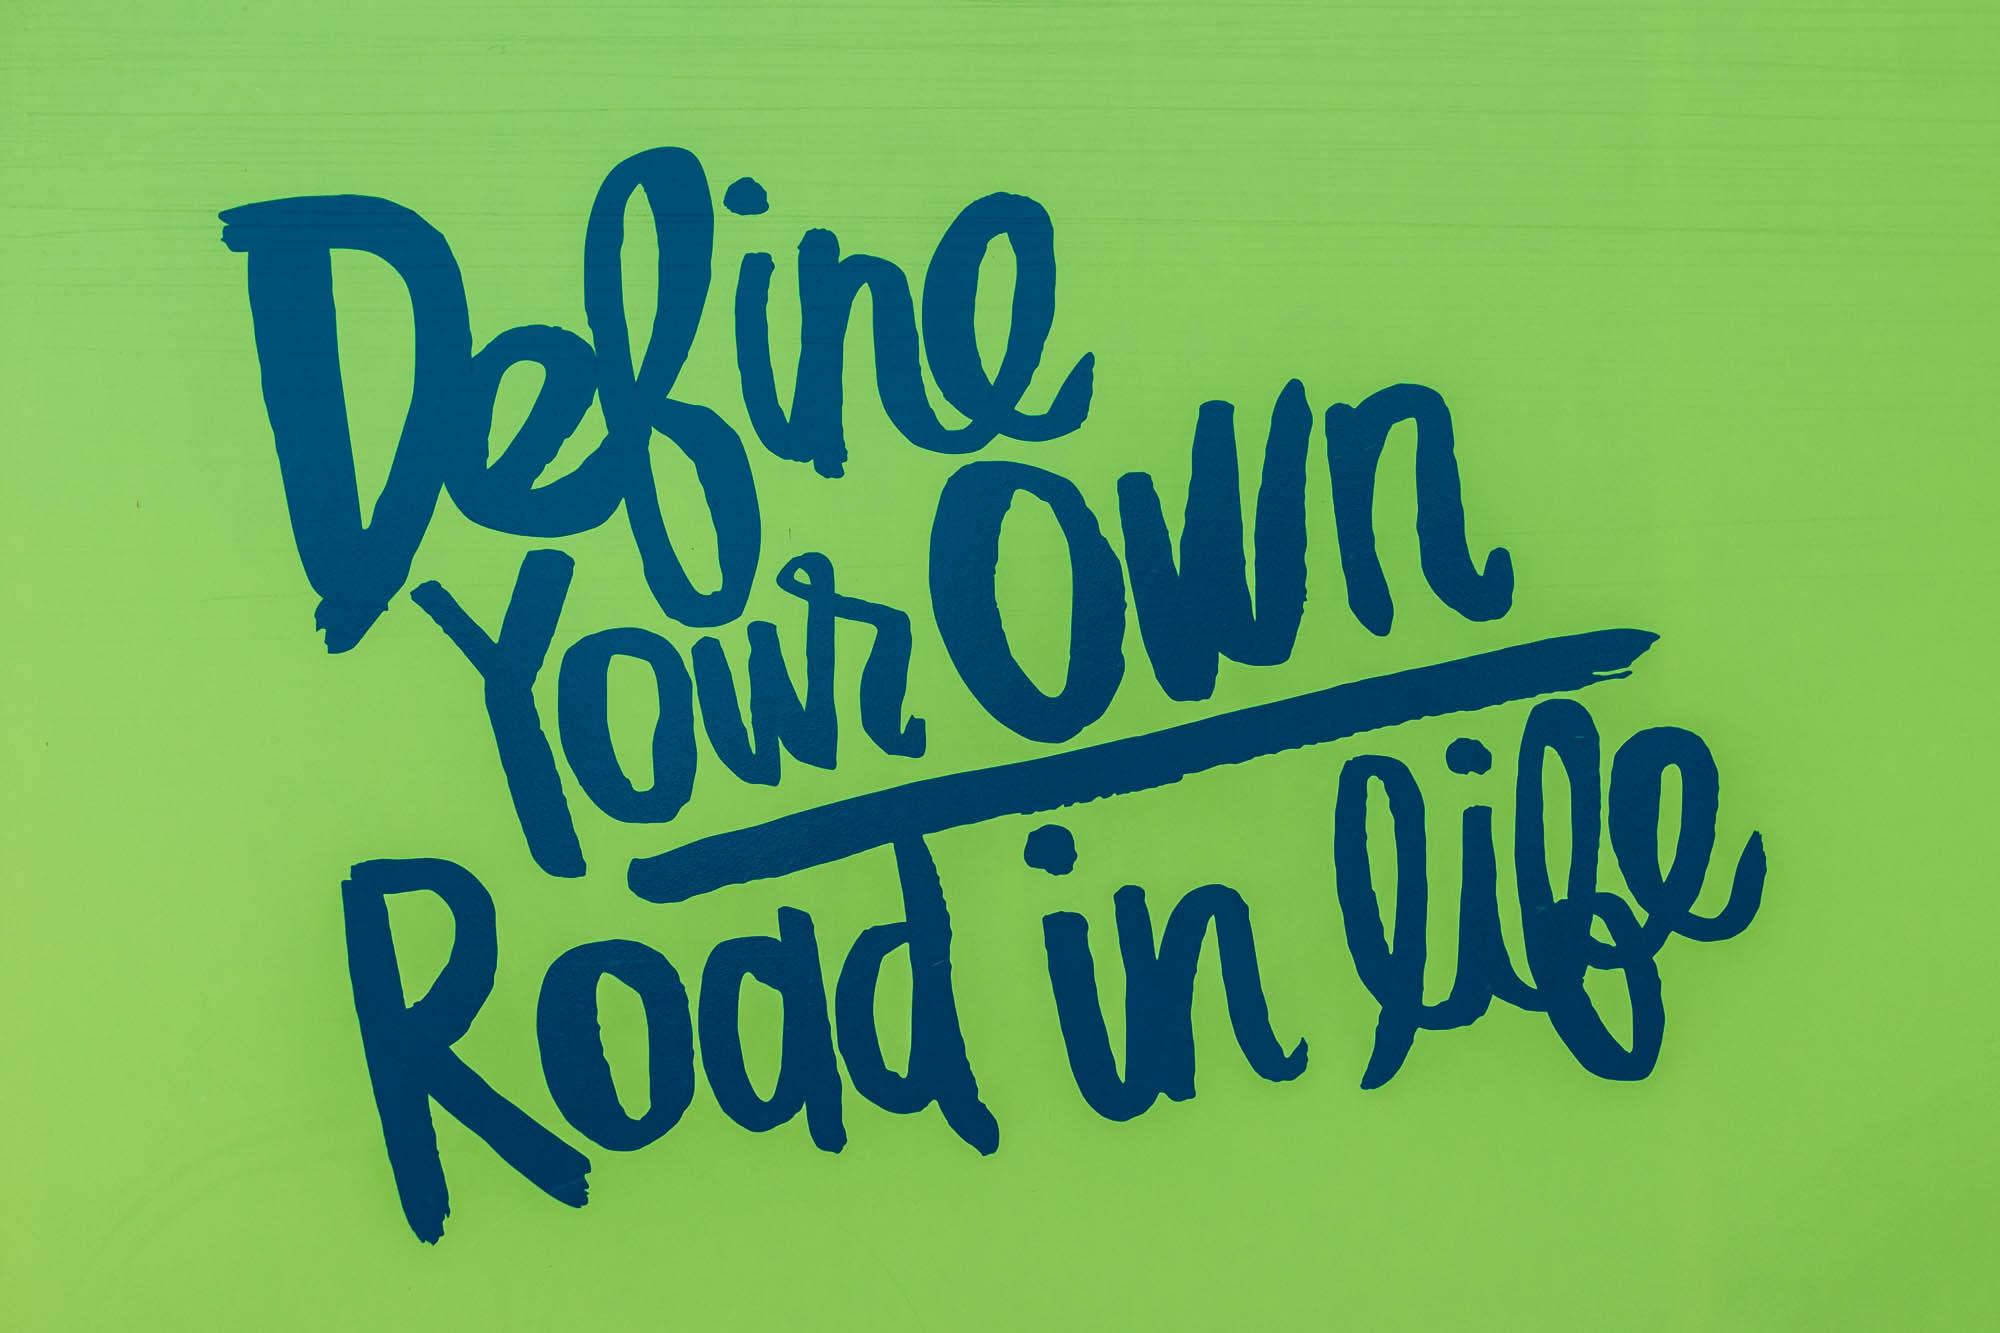 Driving down success lane